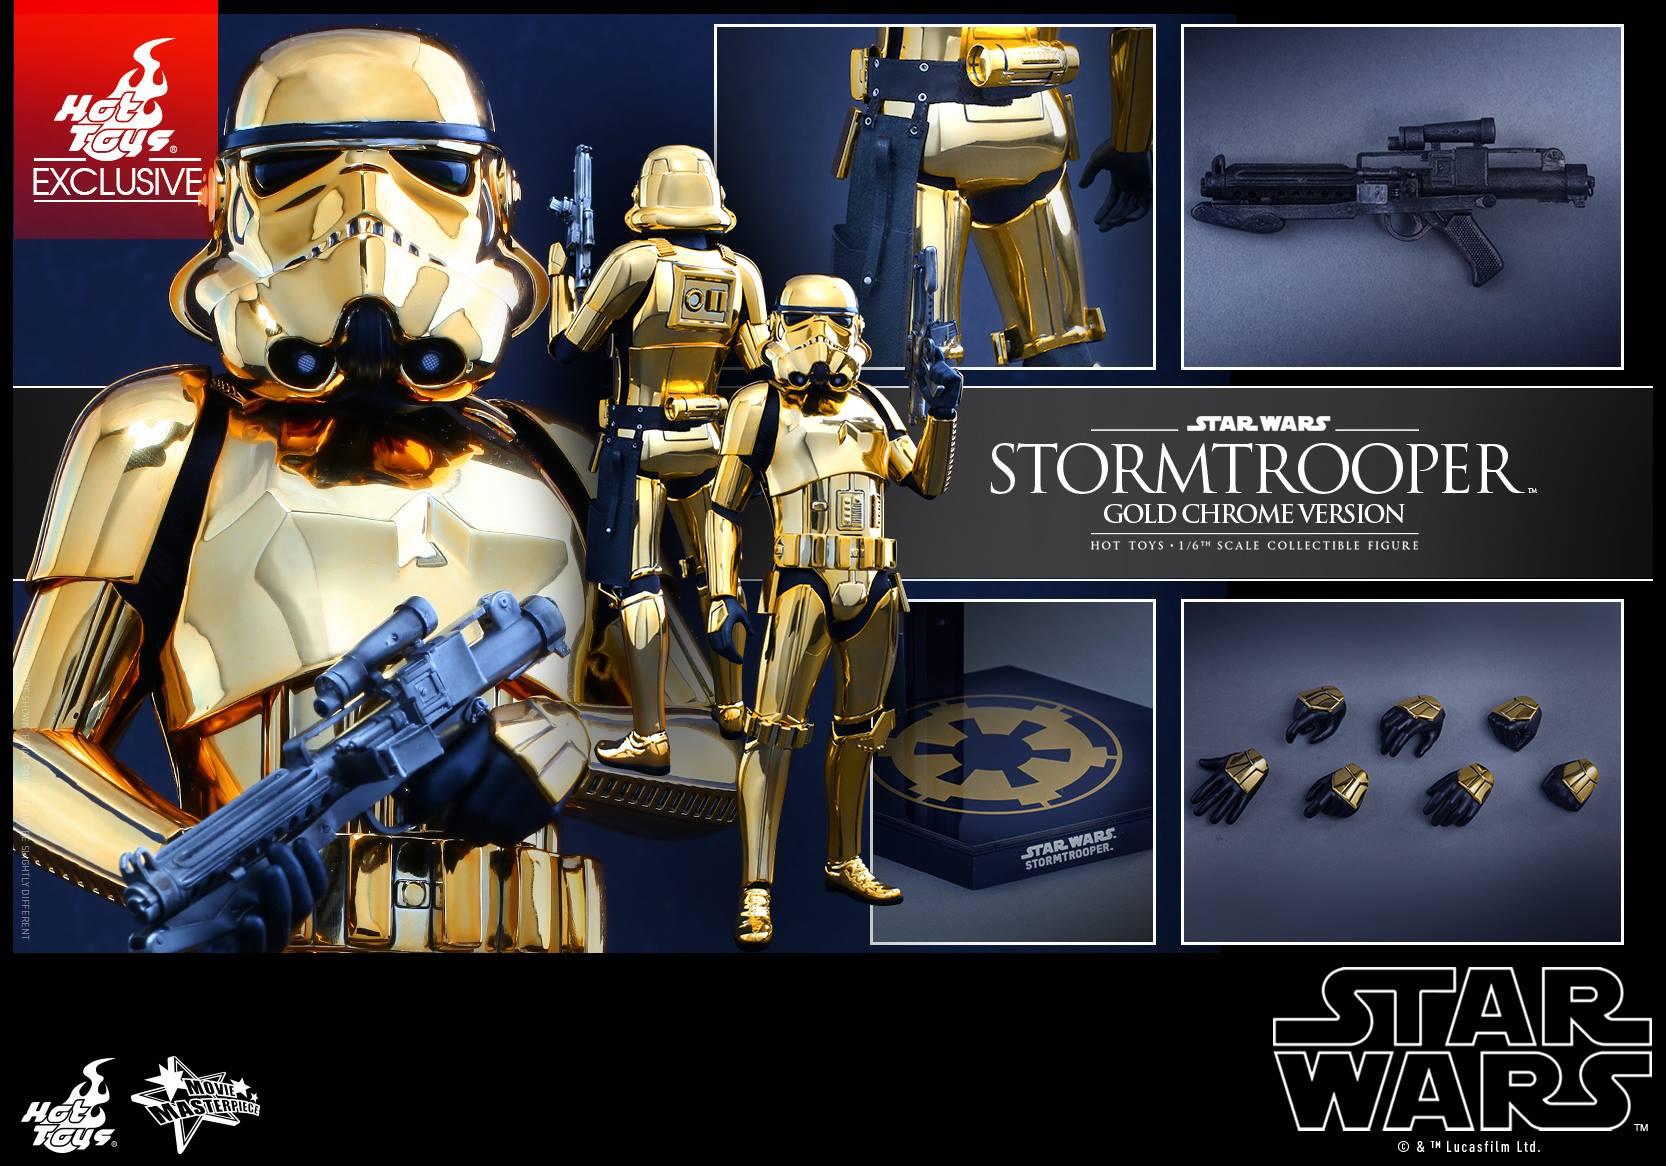 Offizielle Bilder zum Hot Toys Gold Chrome Stormtrooper